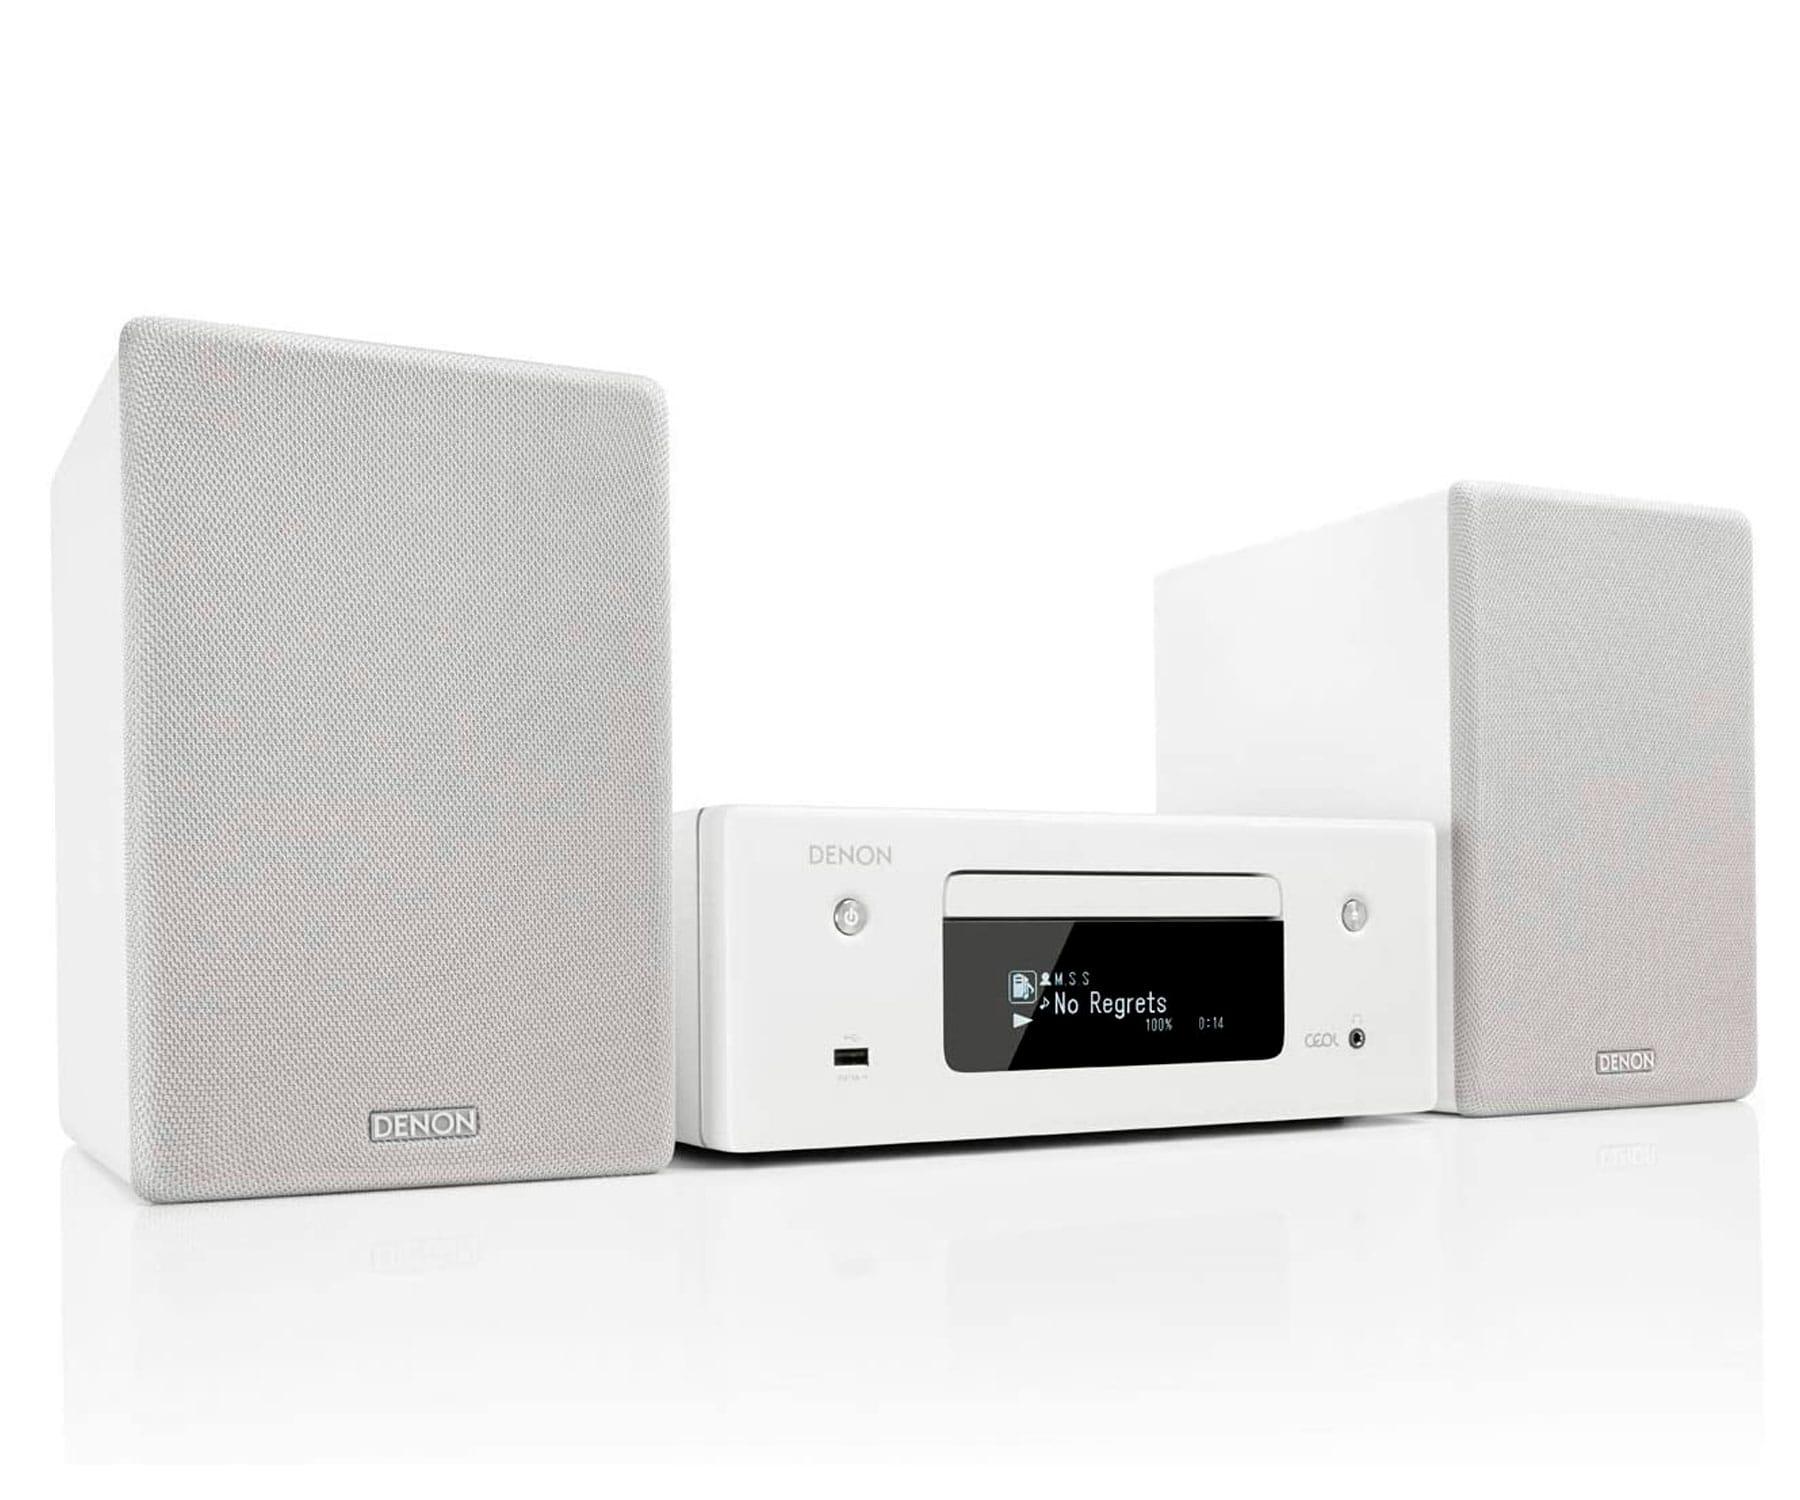 DENON CEOL N10 Blanca Microcadena/Bluetooth/130W RMS/Airplay 2/Tecnología Heos